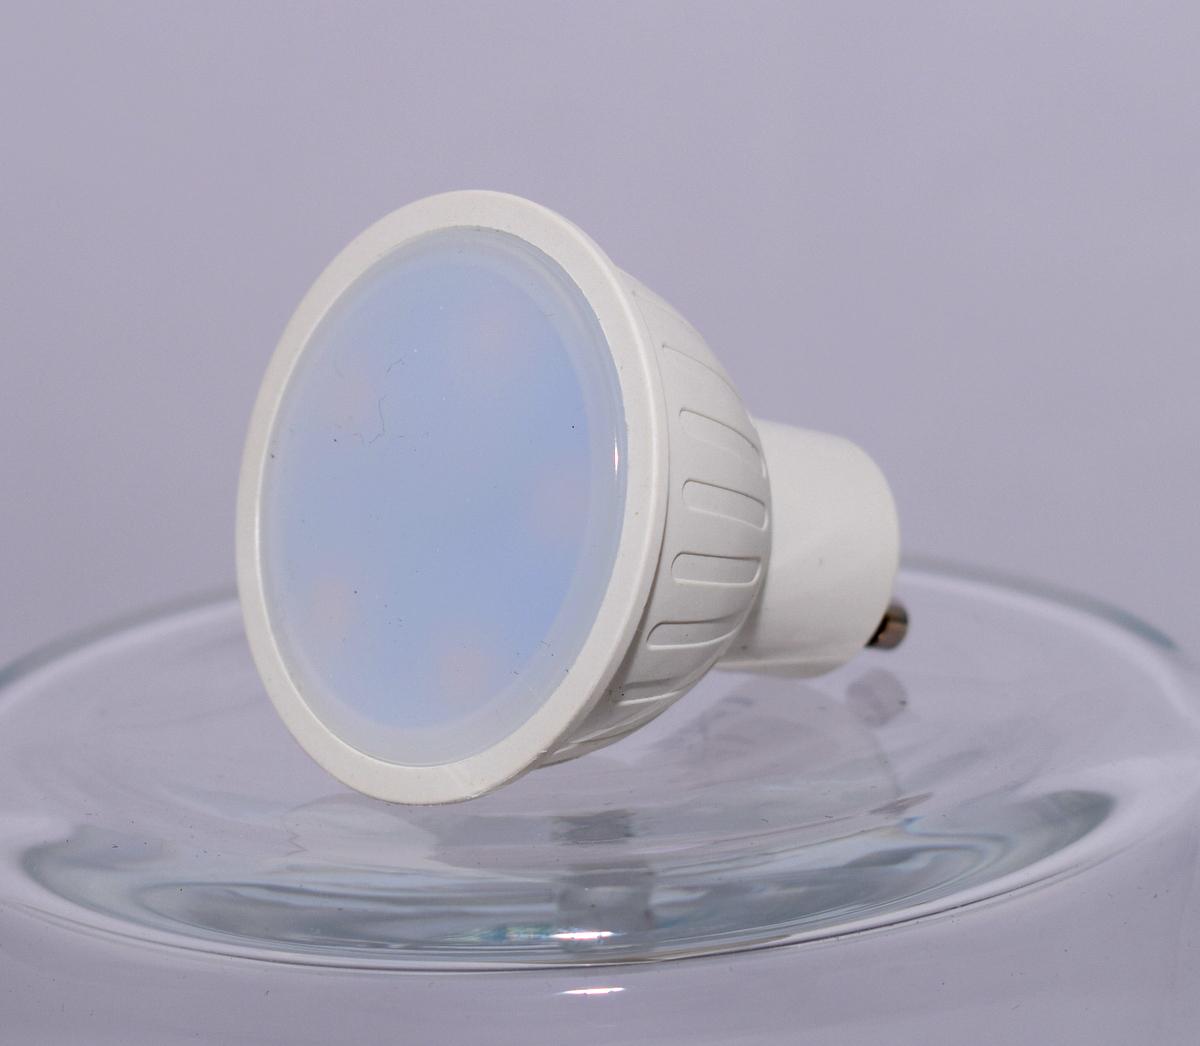 gu10 5 watt lampe leuchtmittel strahler spot mr16 400 lumen 3000k warmwei leuchtmittel gu10 led. Black Bedroom Furniture Sets. Home Design Ideas